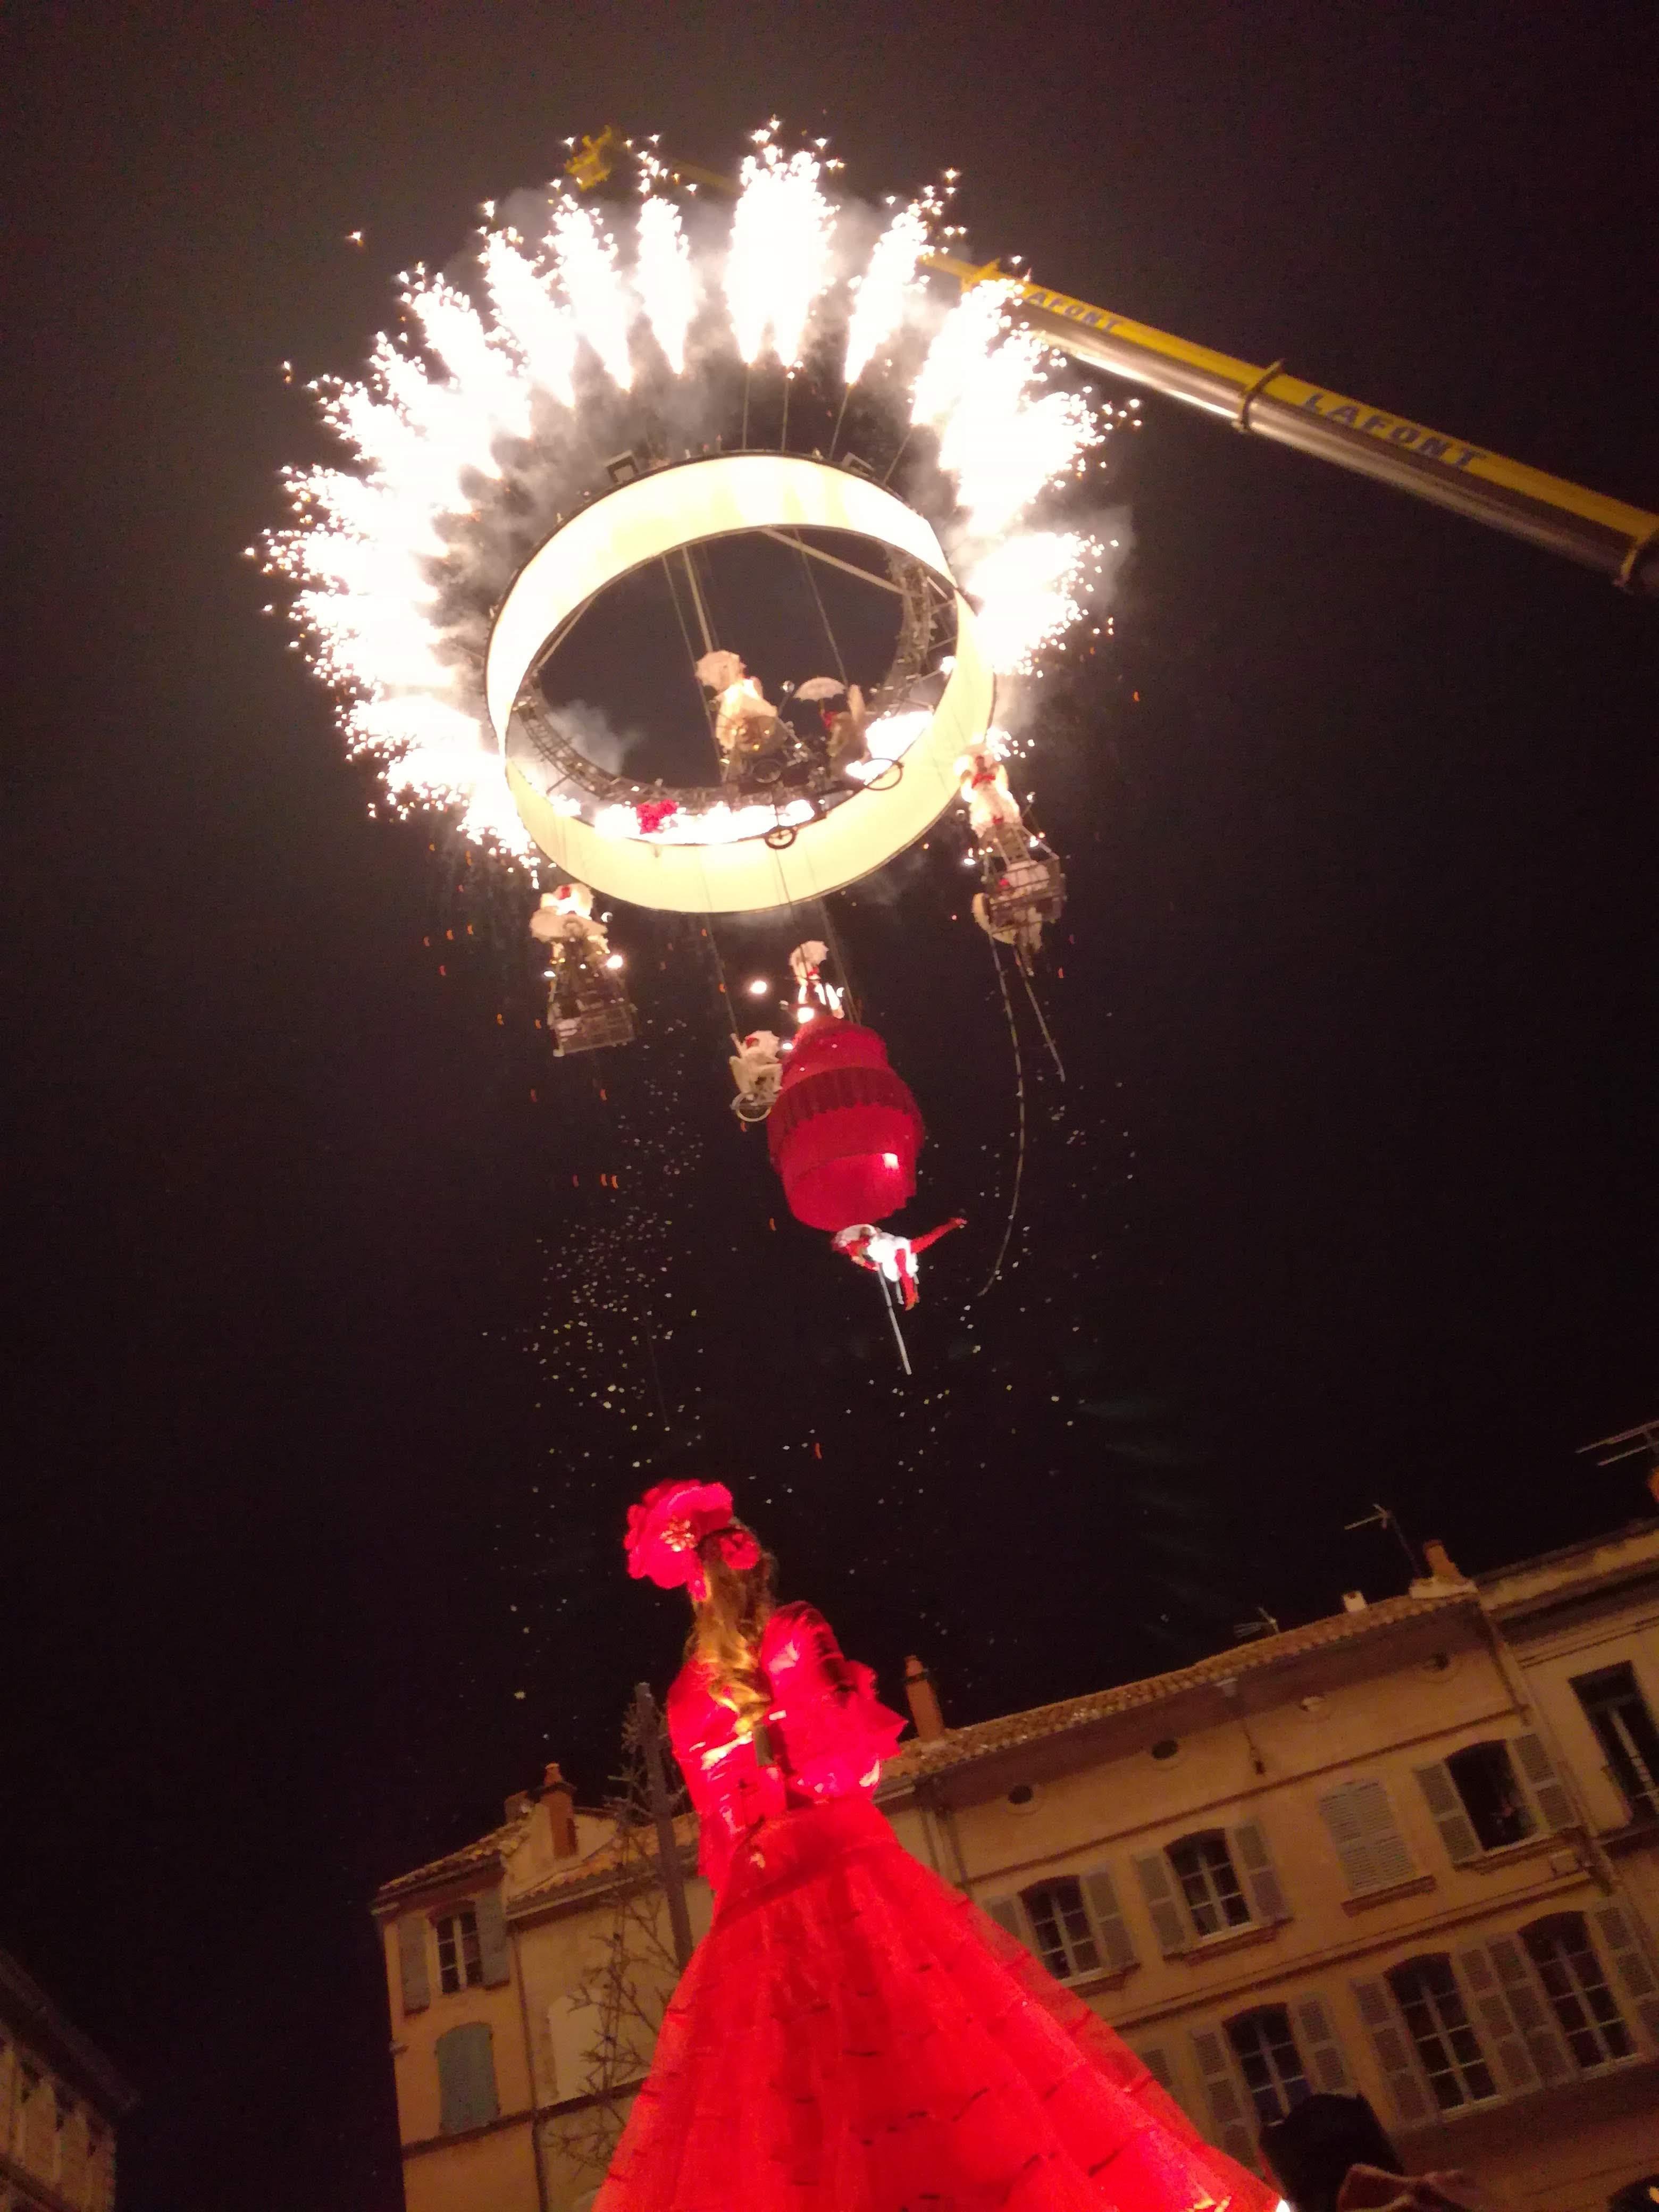 Arles Christmas festival